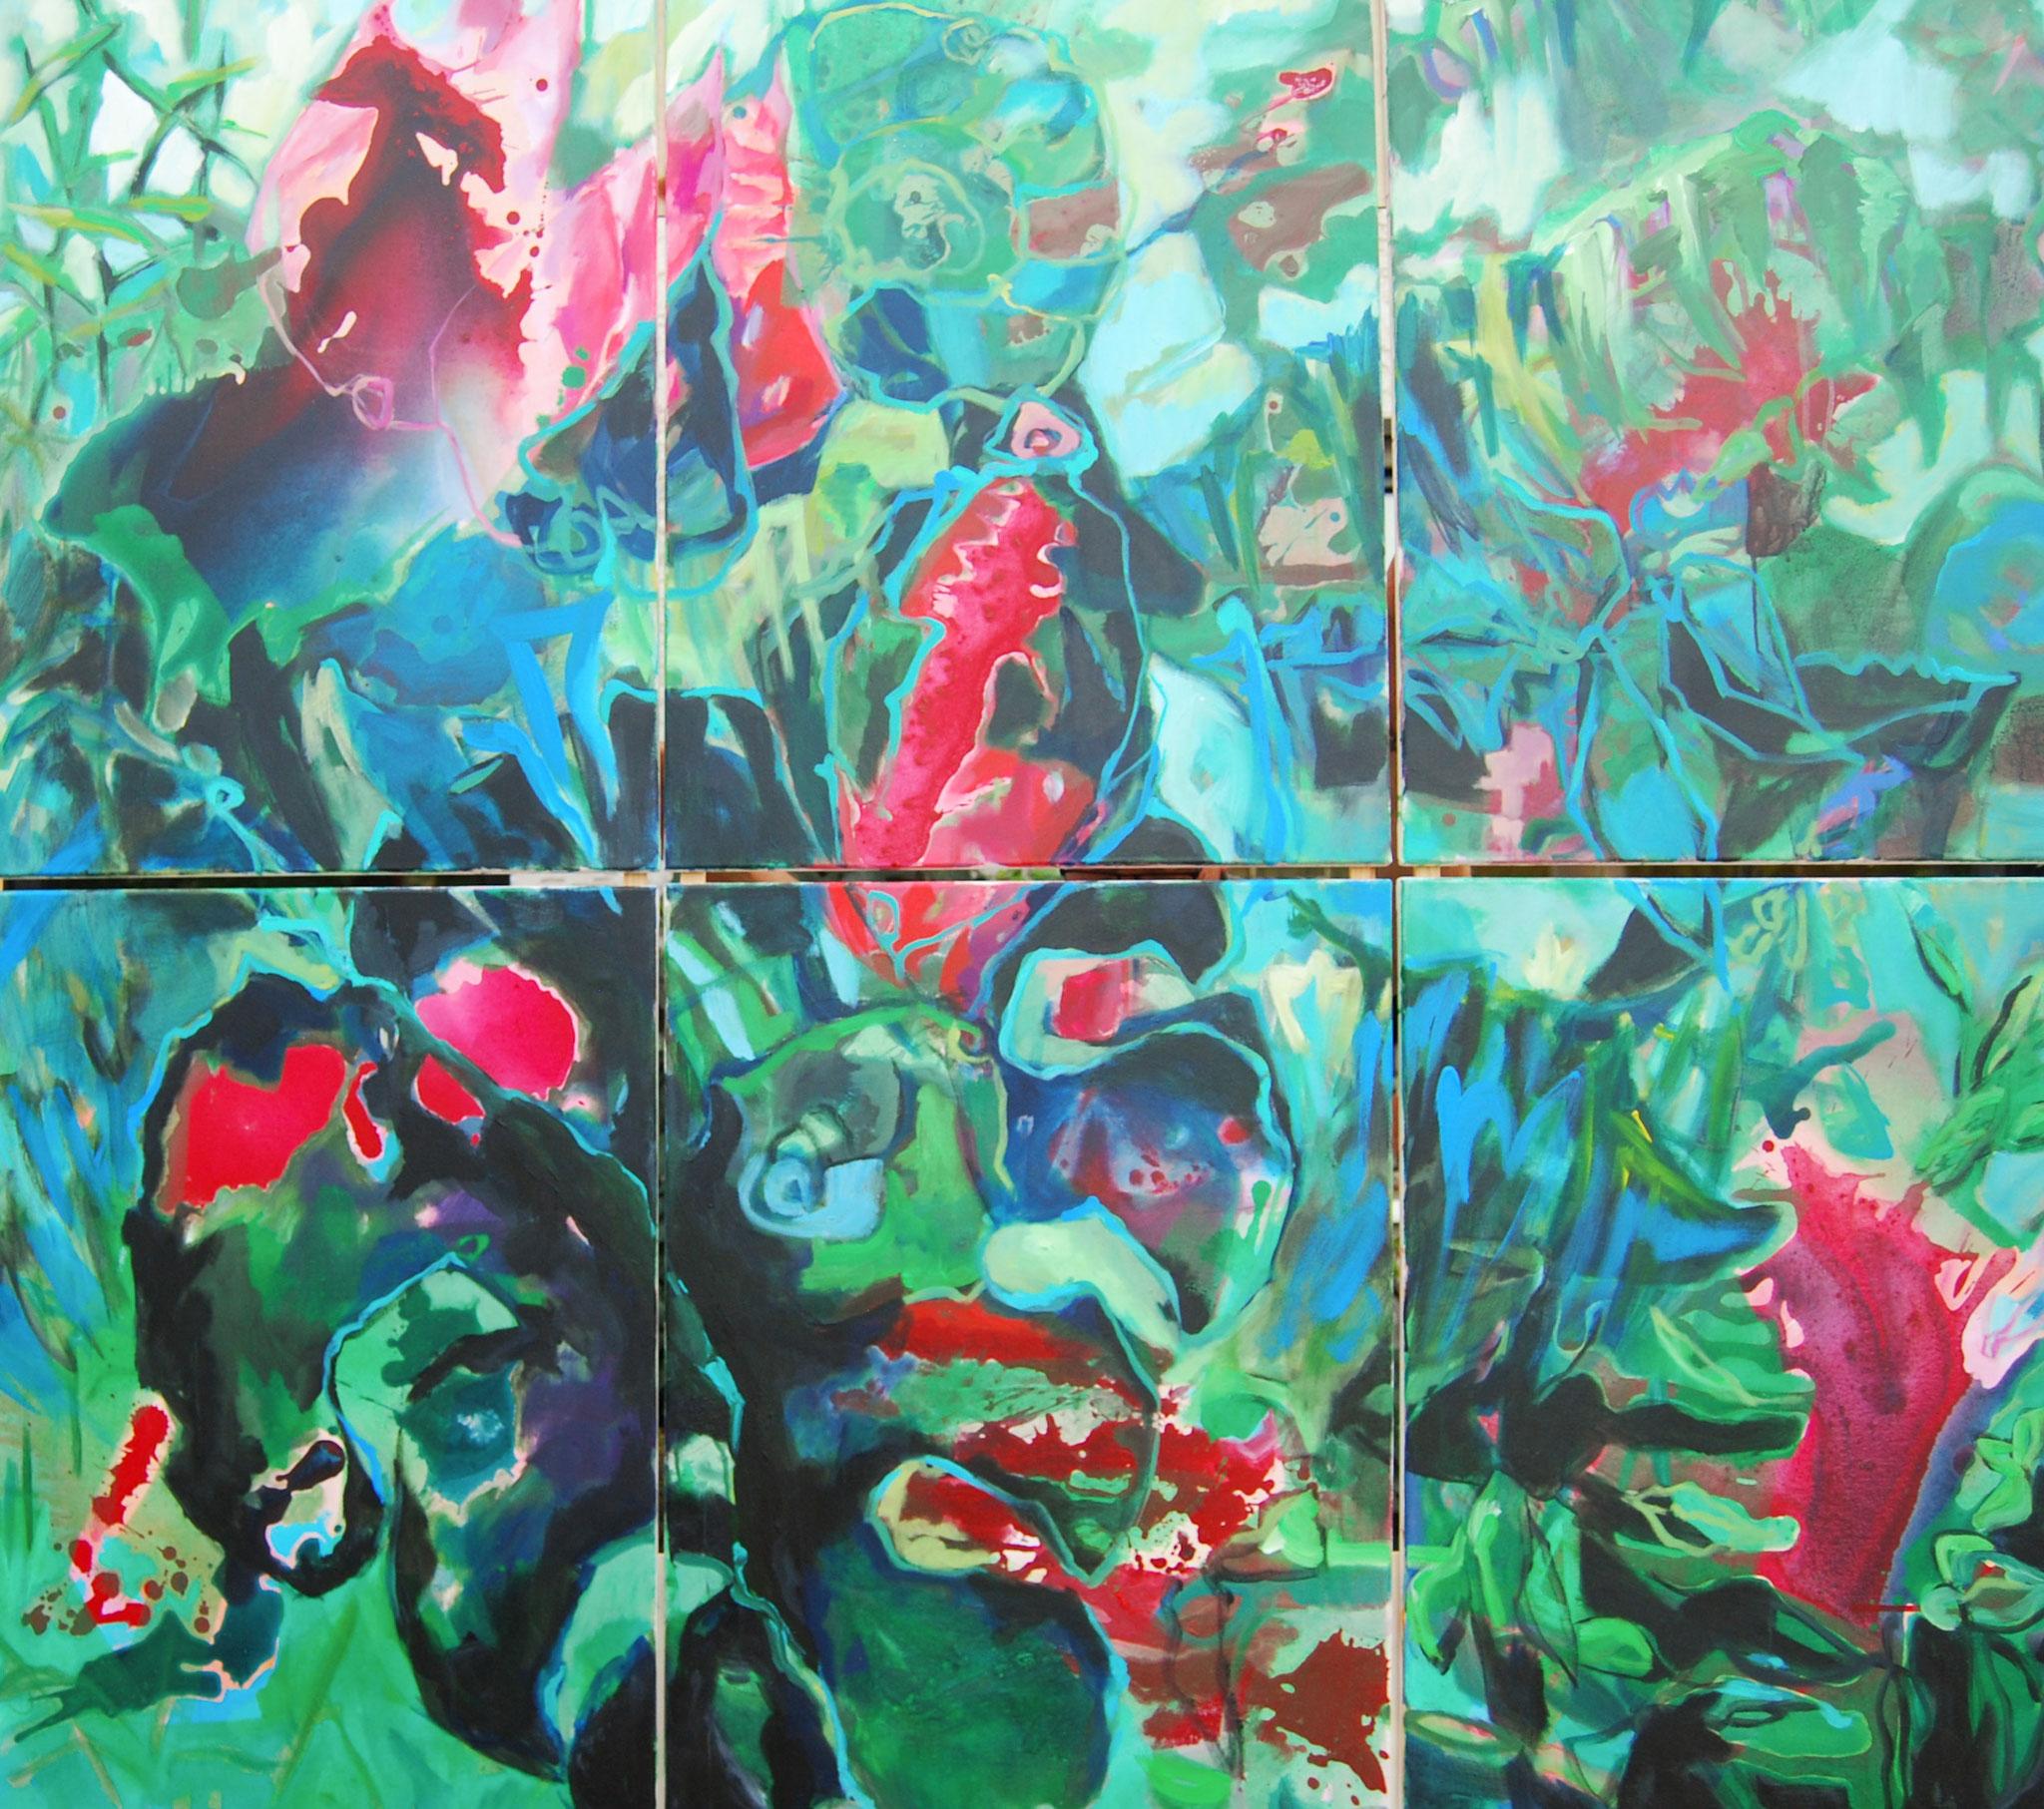 Garden Eden, 2018, Mischtechnik, 160 x 180 cm (sechsteilig je 80 x 60 cm)